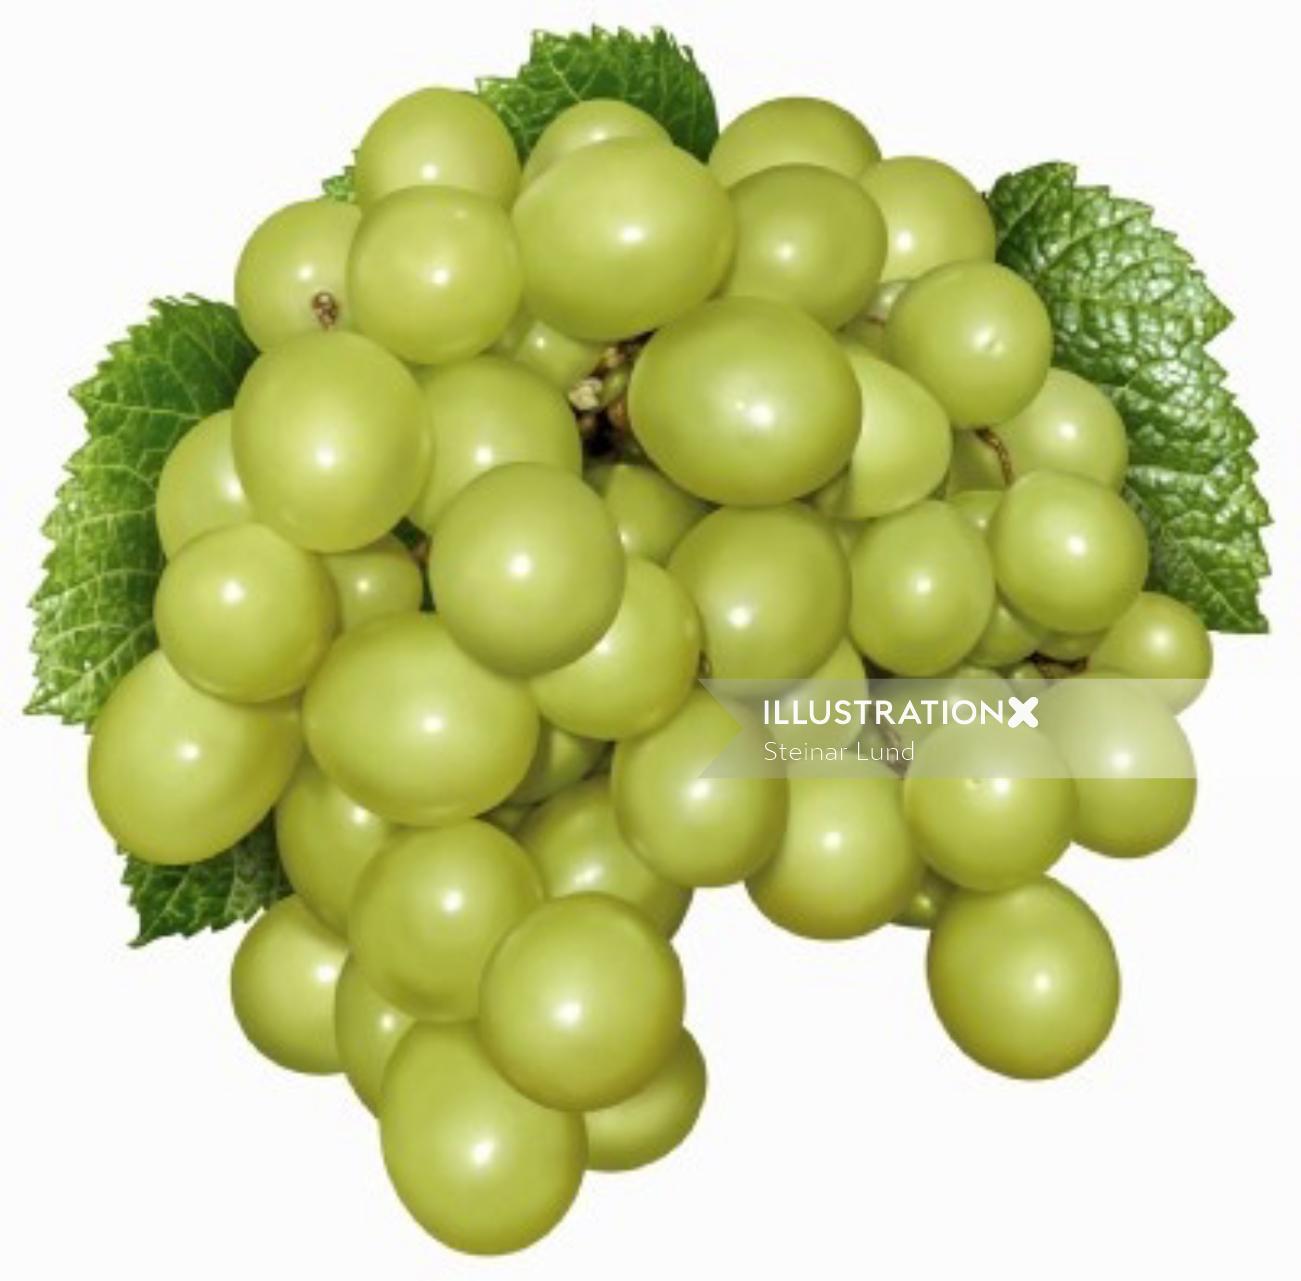 Photorealistic illustration of green grapes